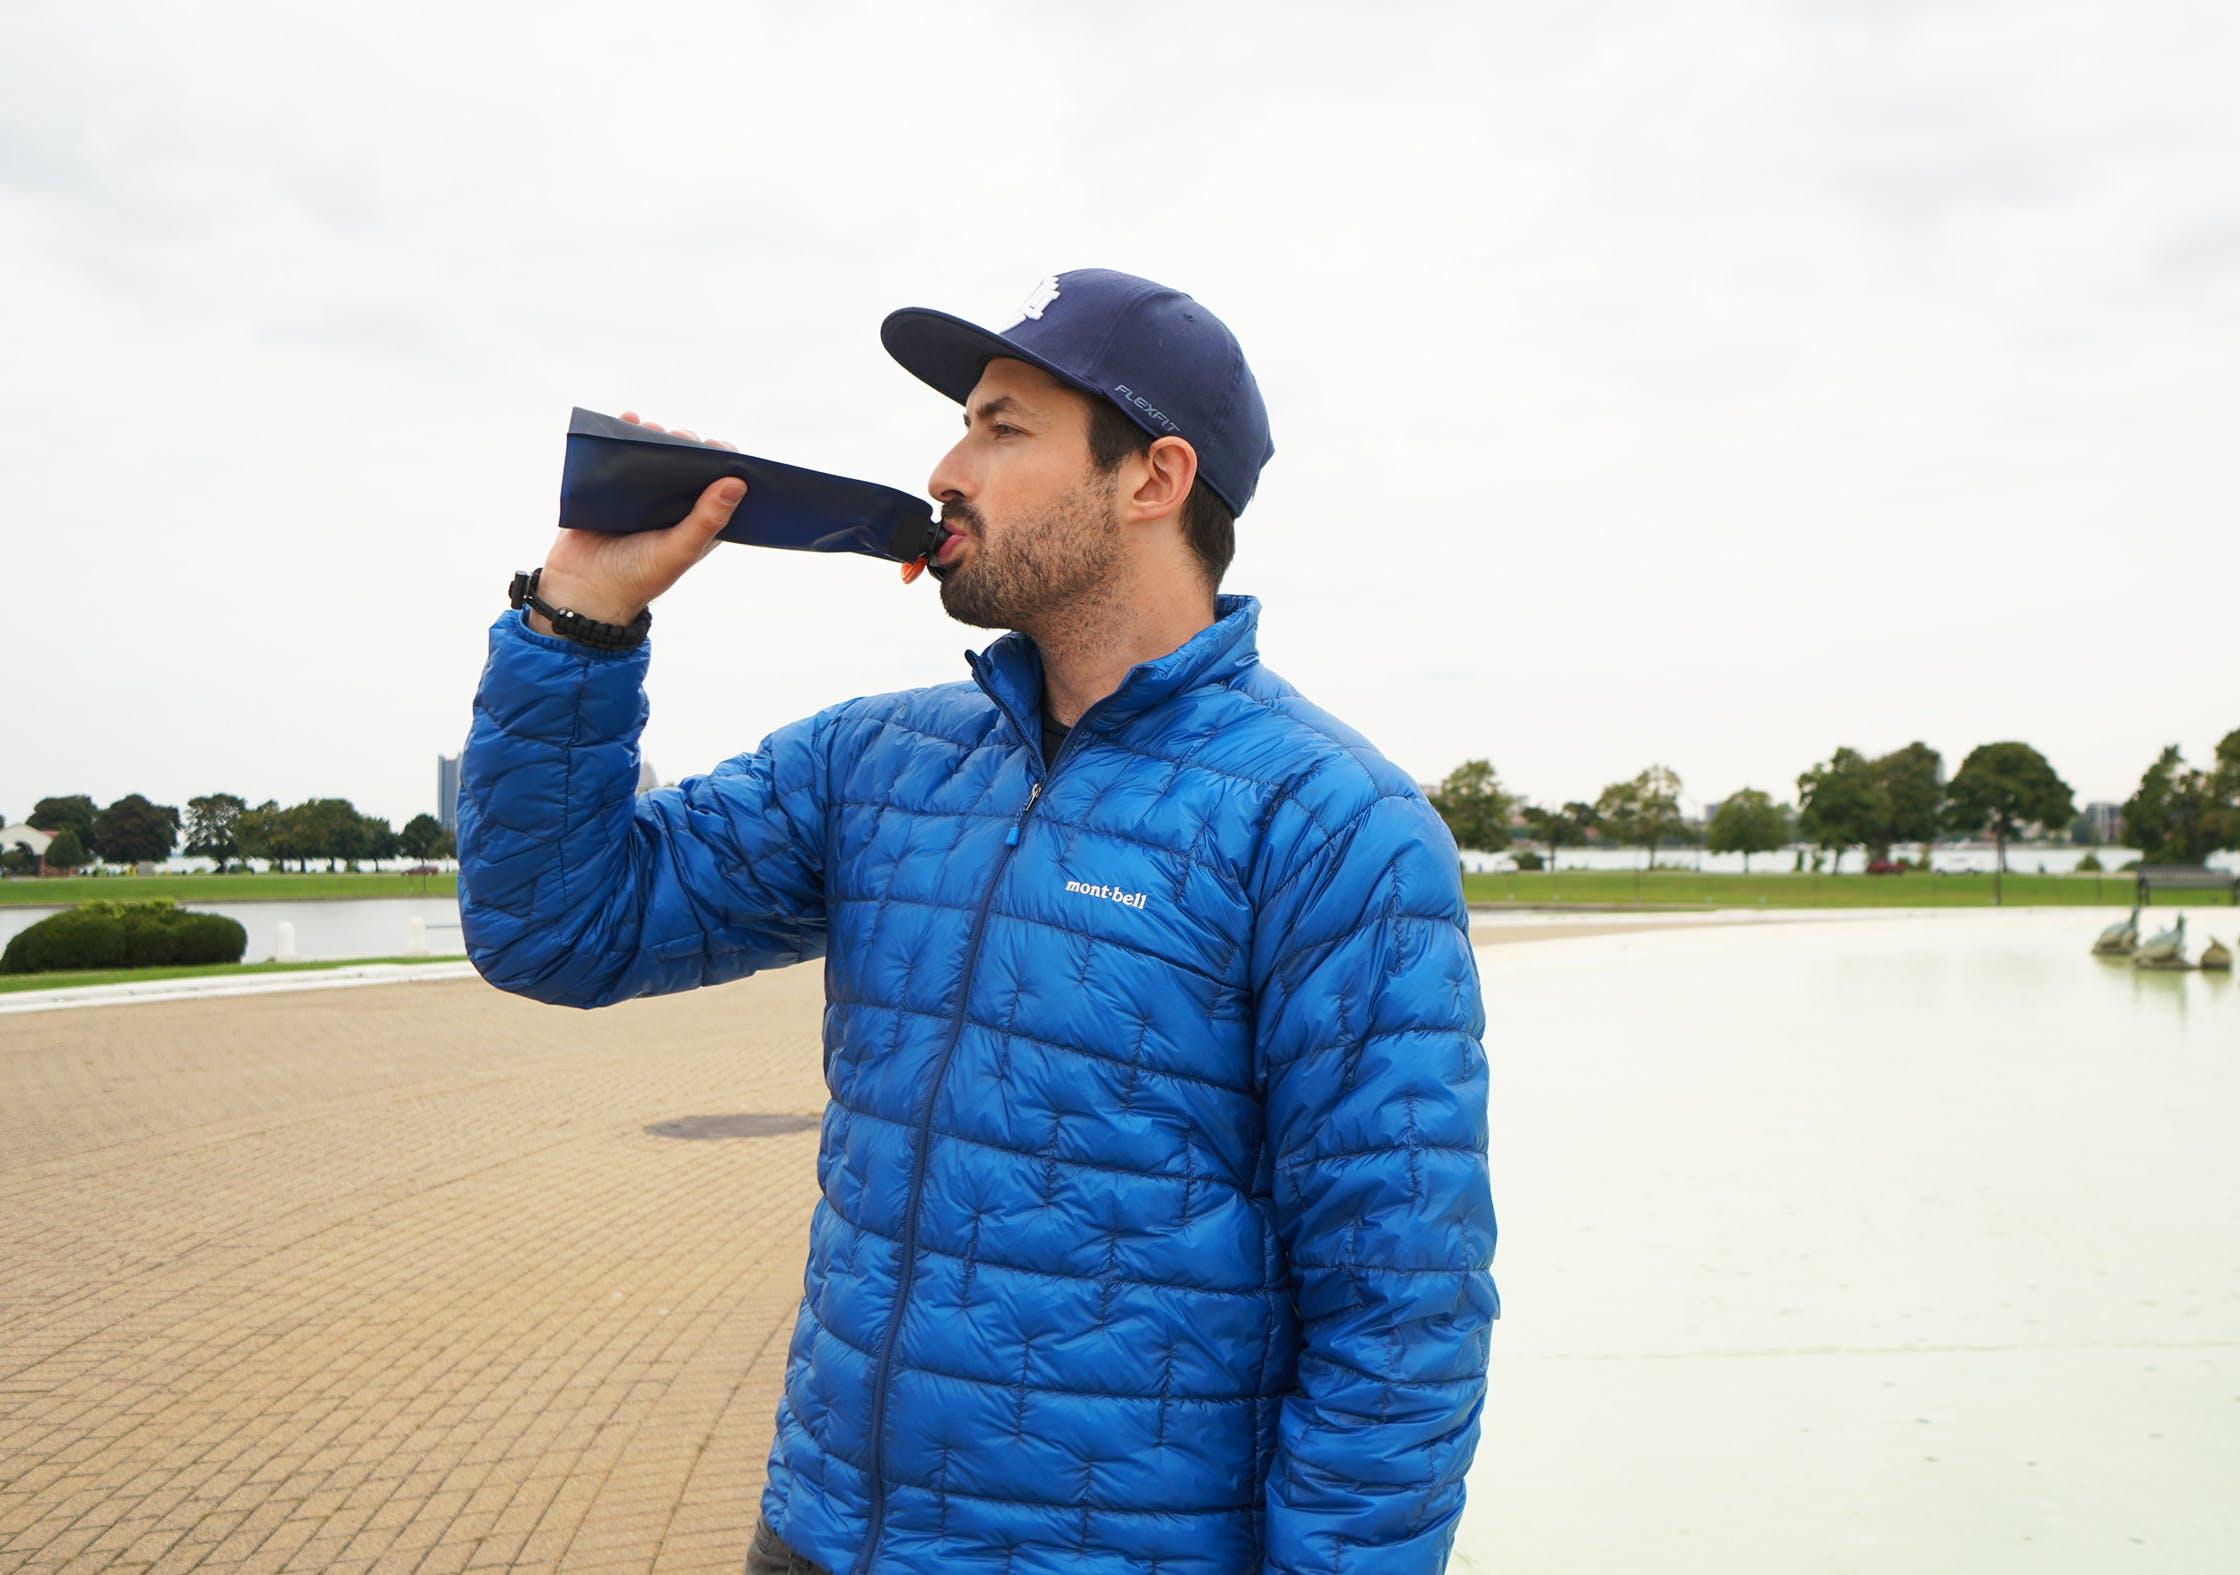 Vapur Eclipse Water Bottle In Use